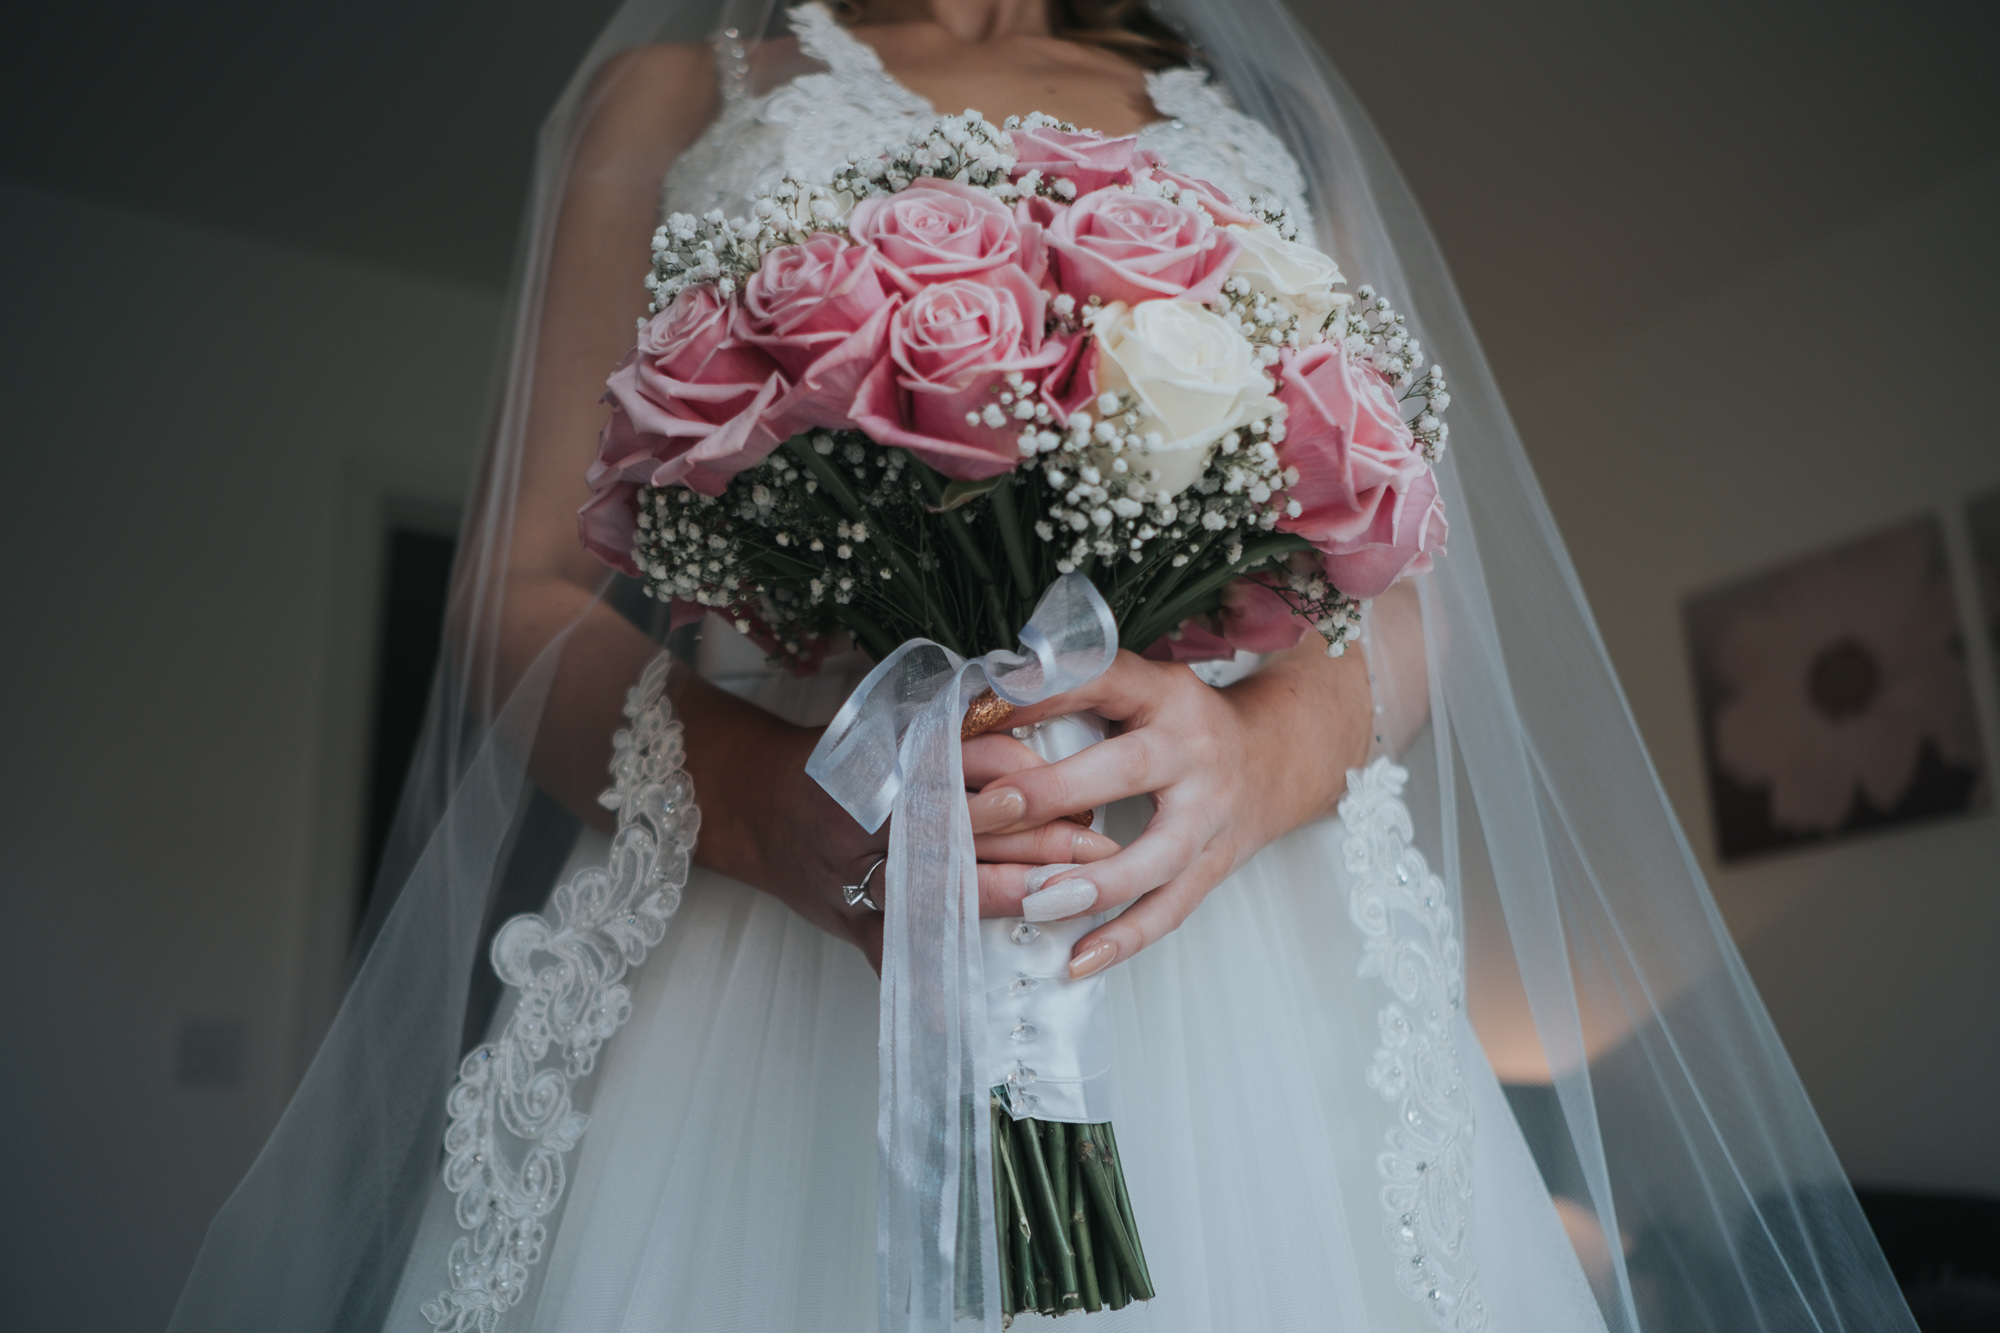 West Tower Exclusive Wedding Venue wedding photography merseyside and lancashire wedding photographer (14 of 60).jpg